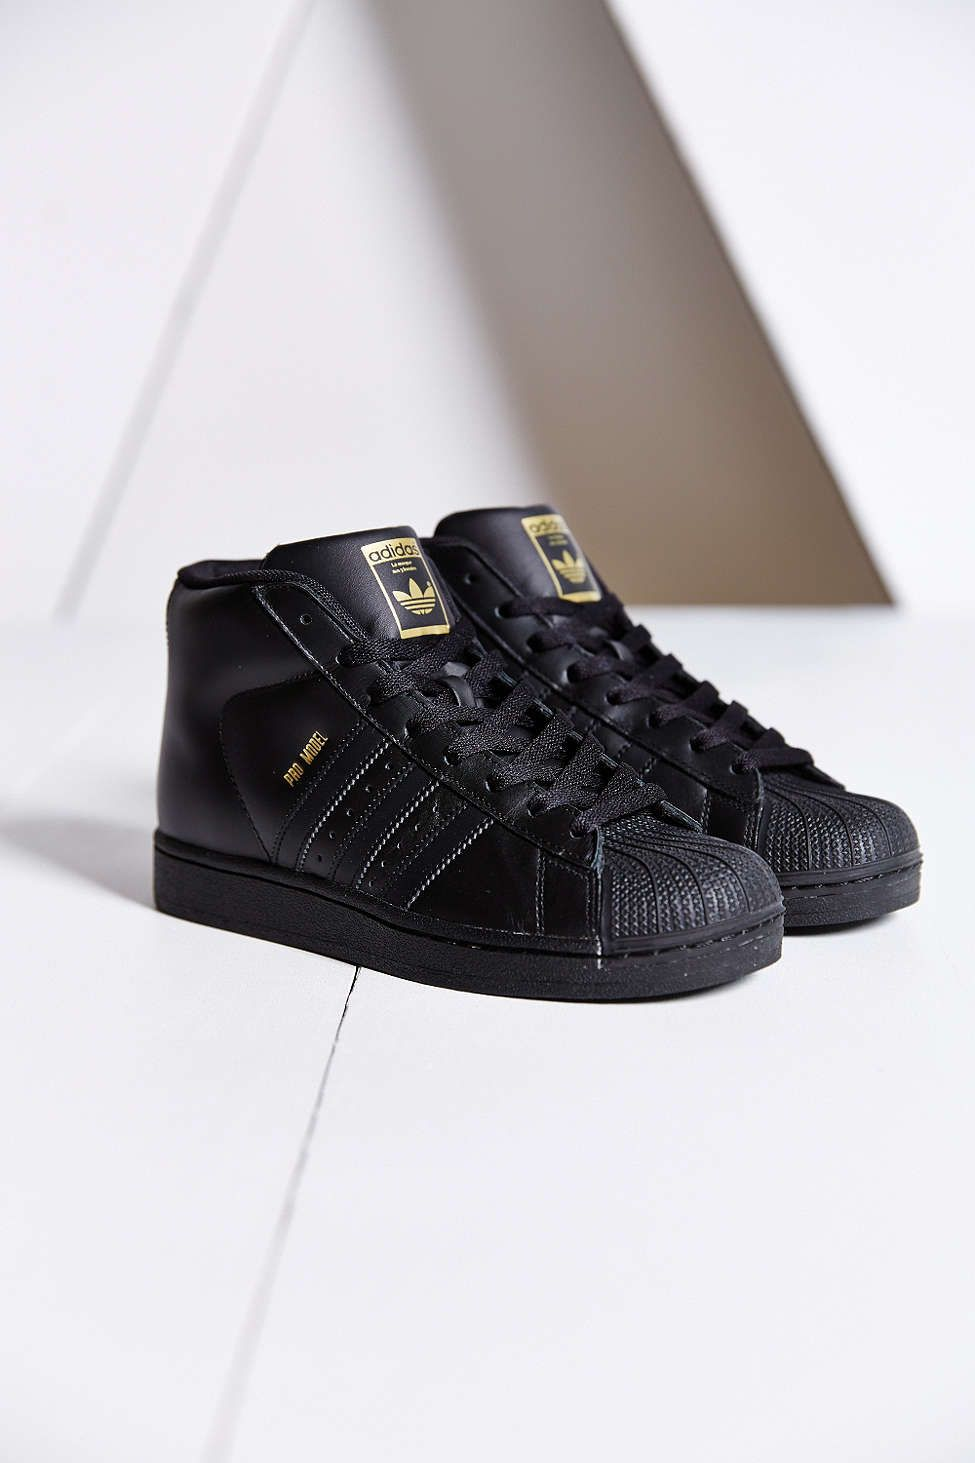 Adidas Originals Pro Model Sneaker Sneakers Nikes Girl Adidas